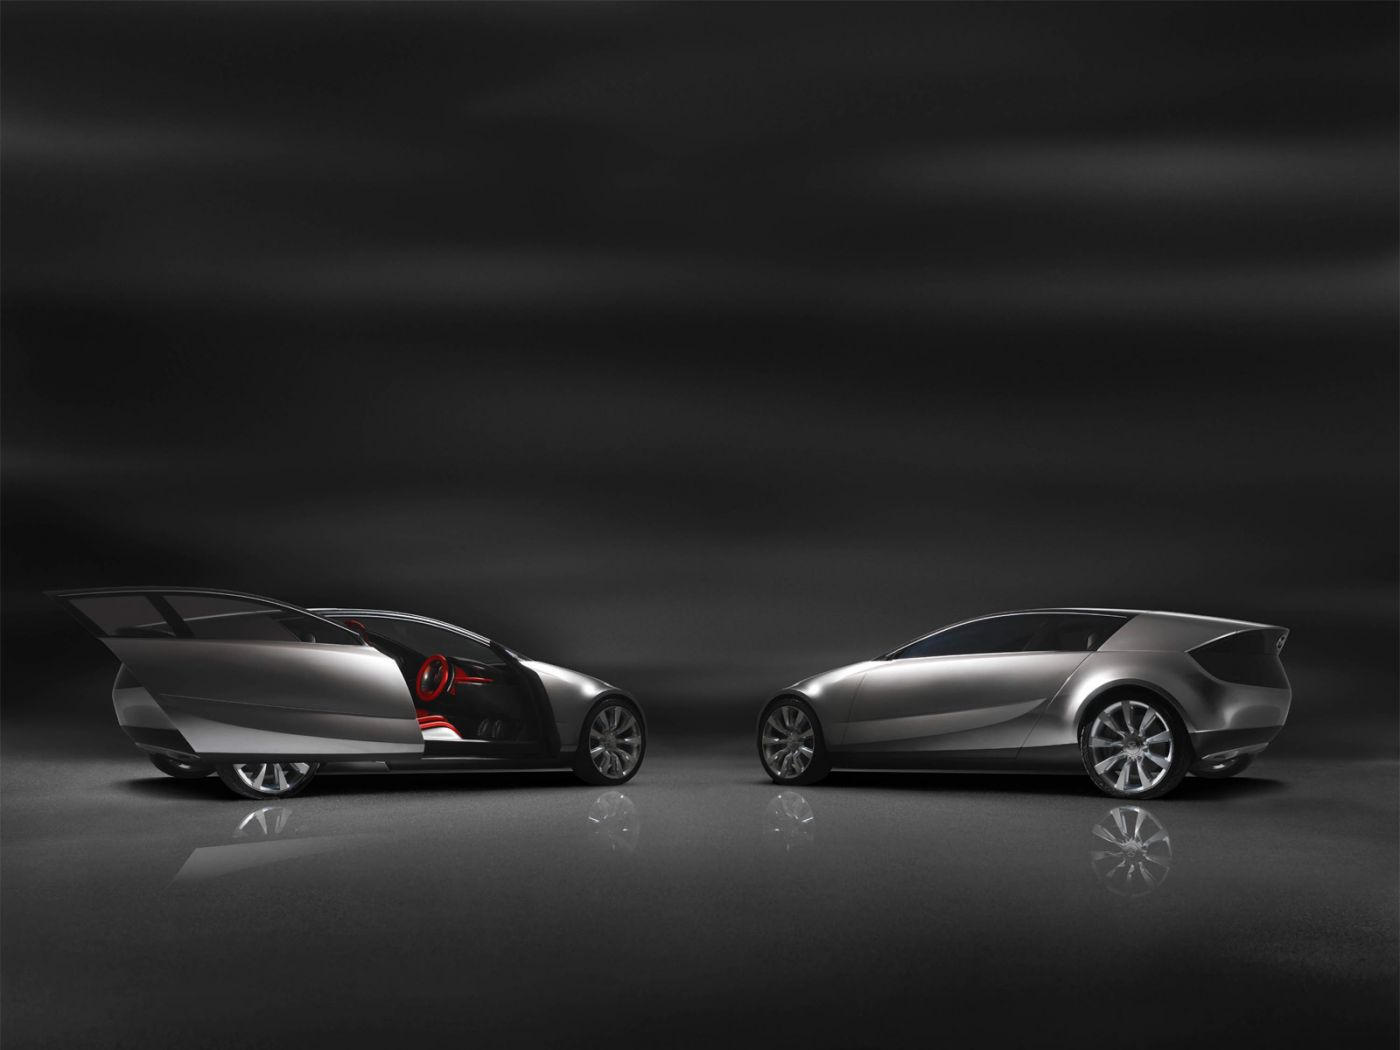 Mazda Senku Concept Side View Wallpaper 1400x1050